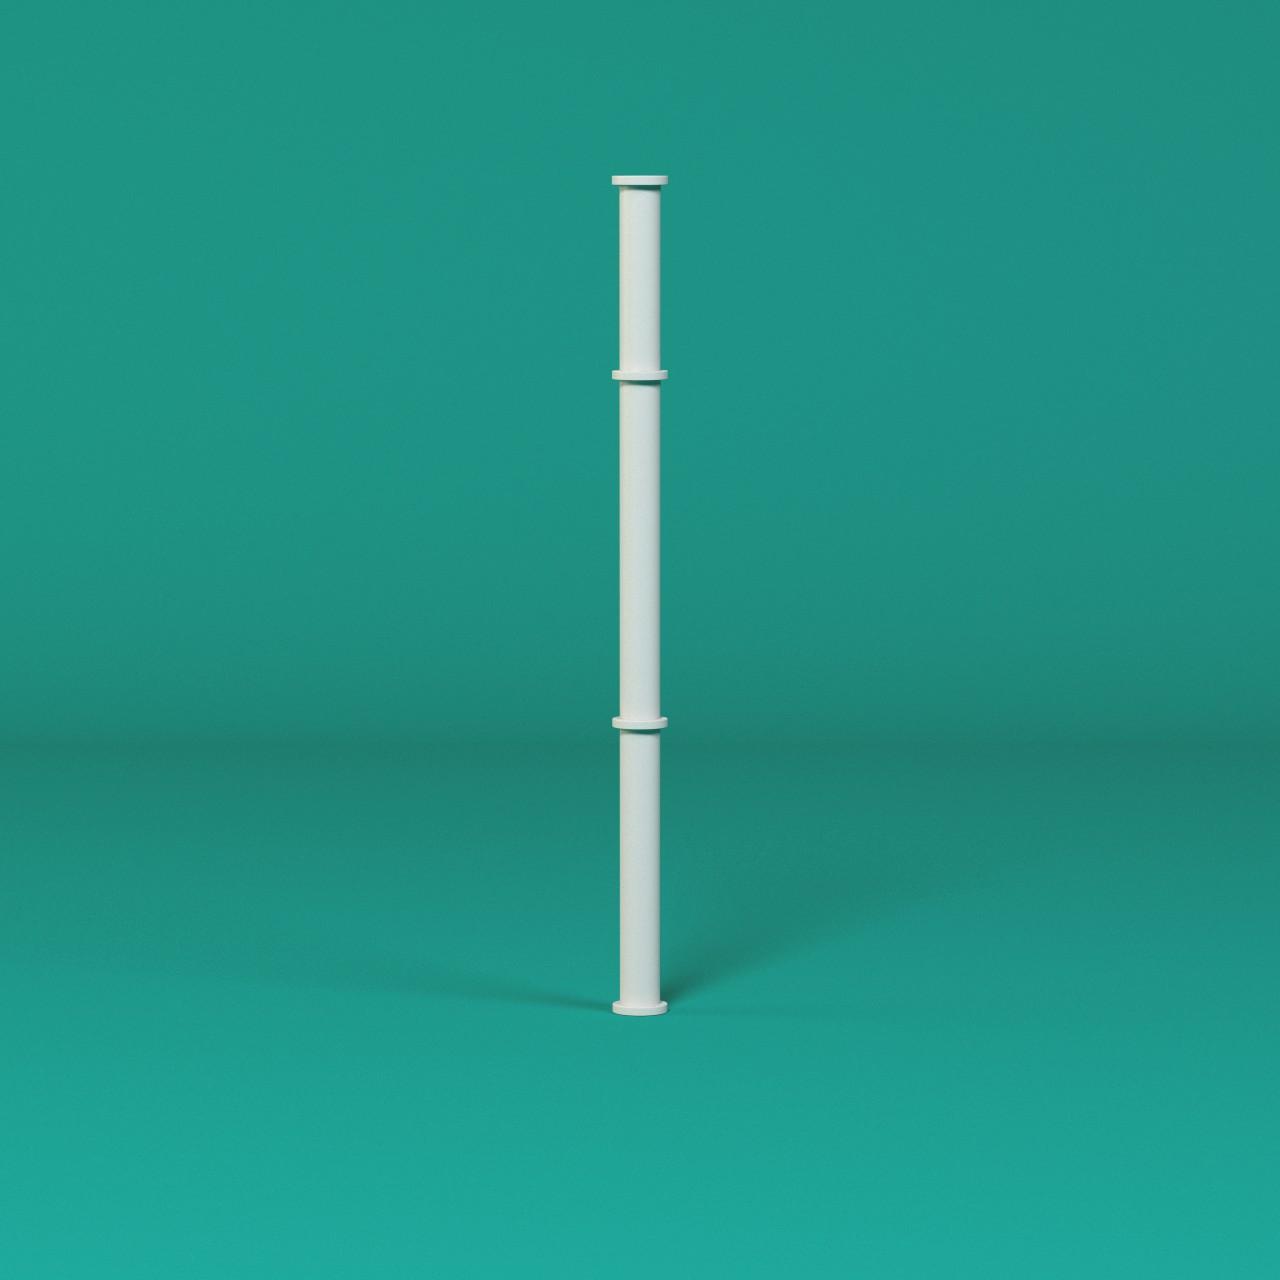 tall_smoke_stack_v1_1.jpg